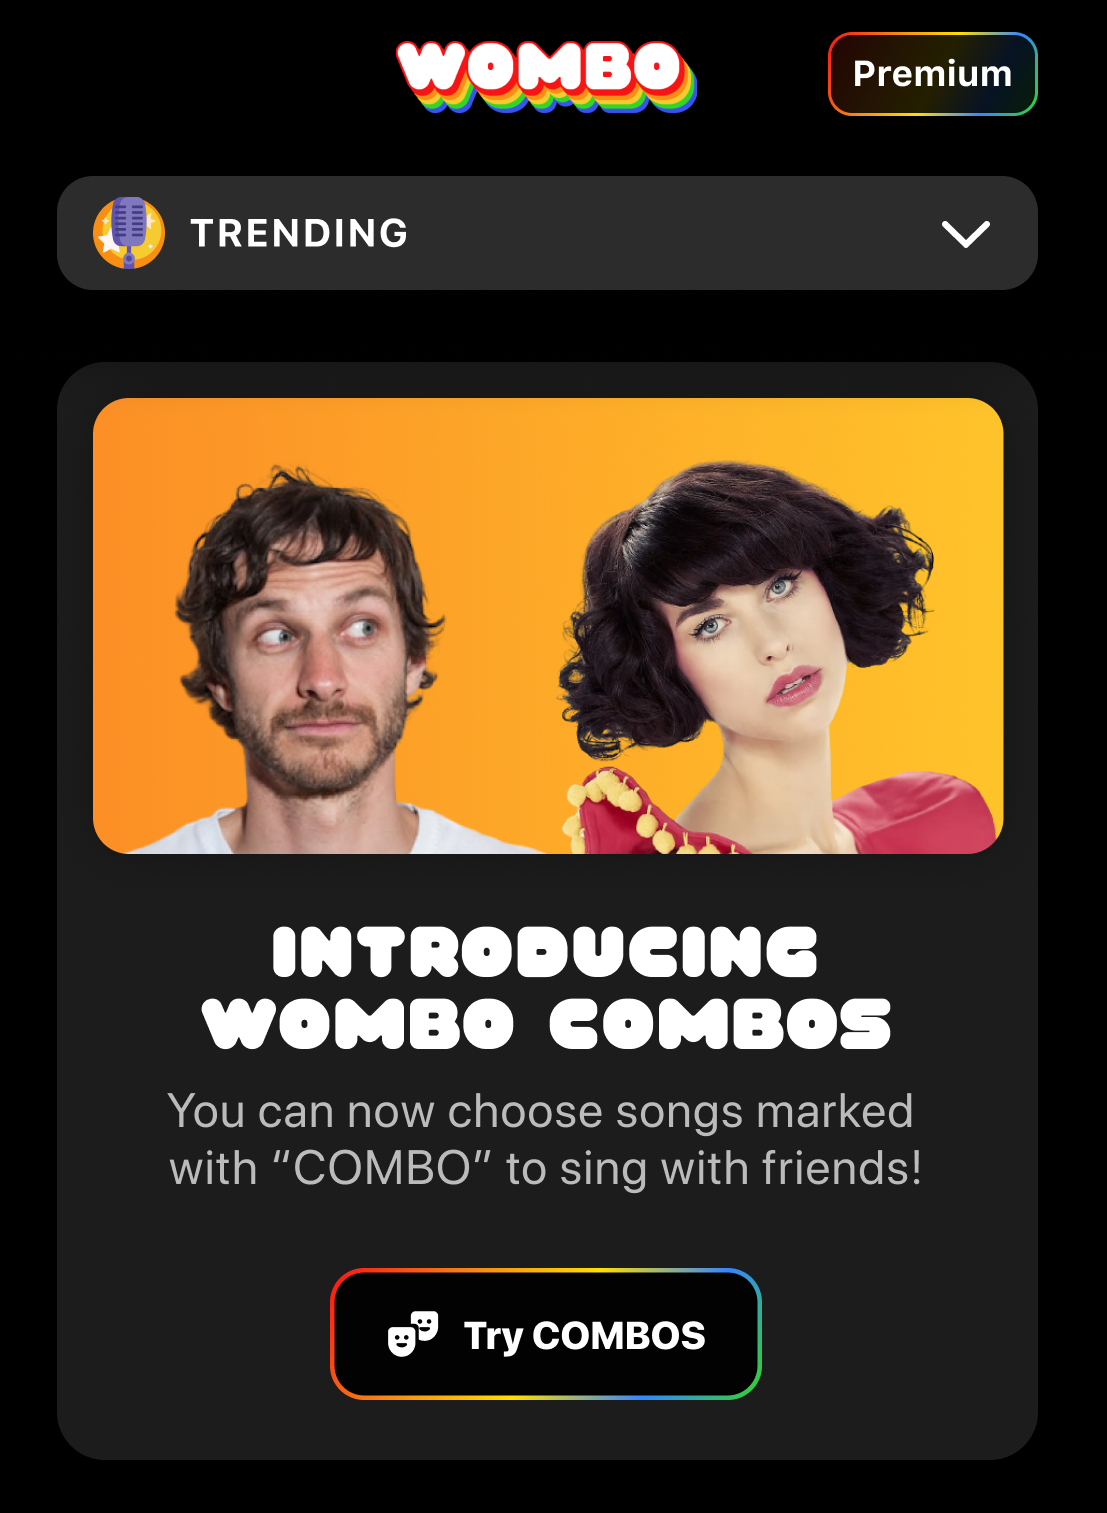 Introducing WOMBO COMBOs